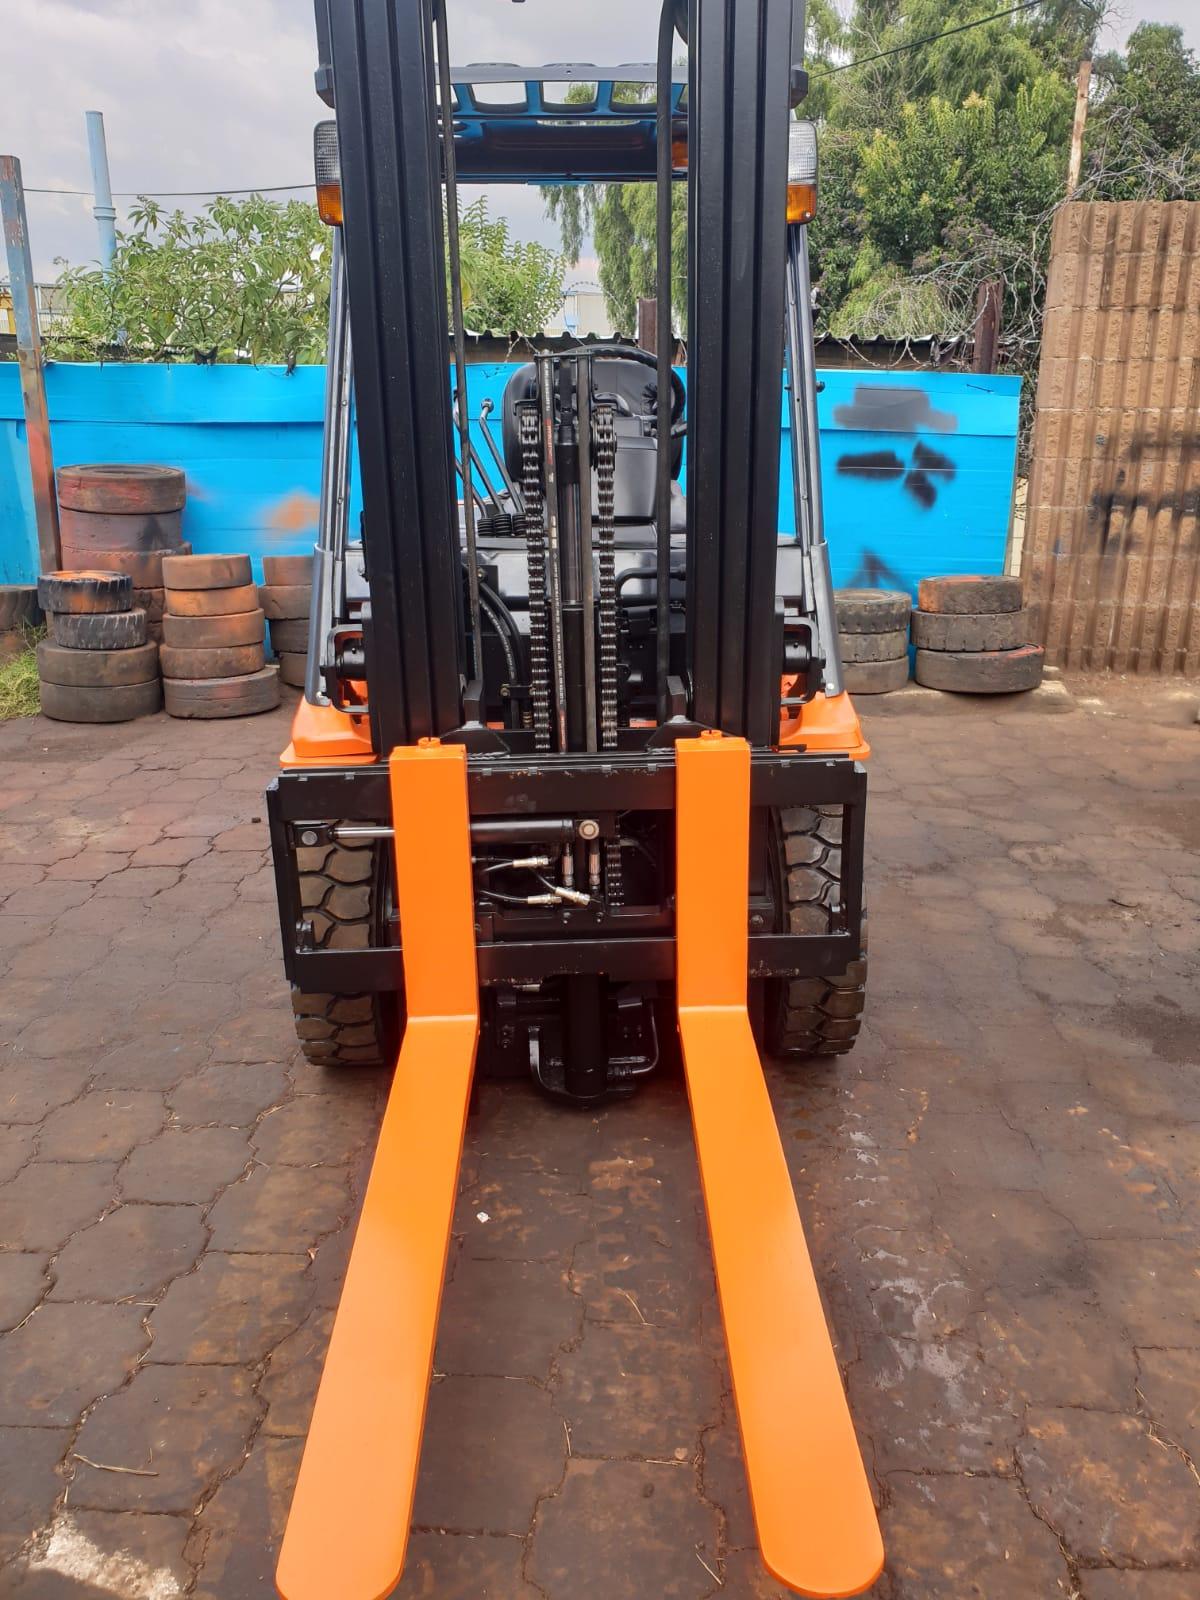 Toyota Forklift 7Series 2.5 ton diesel